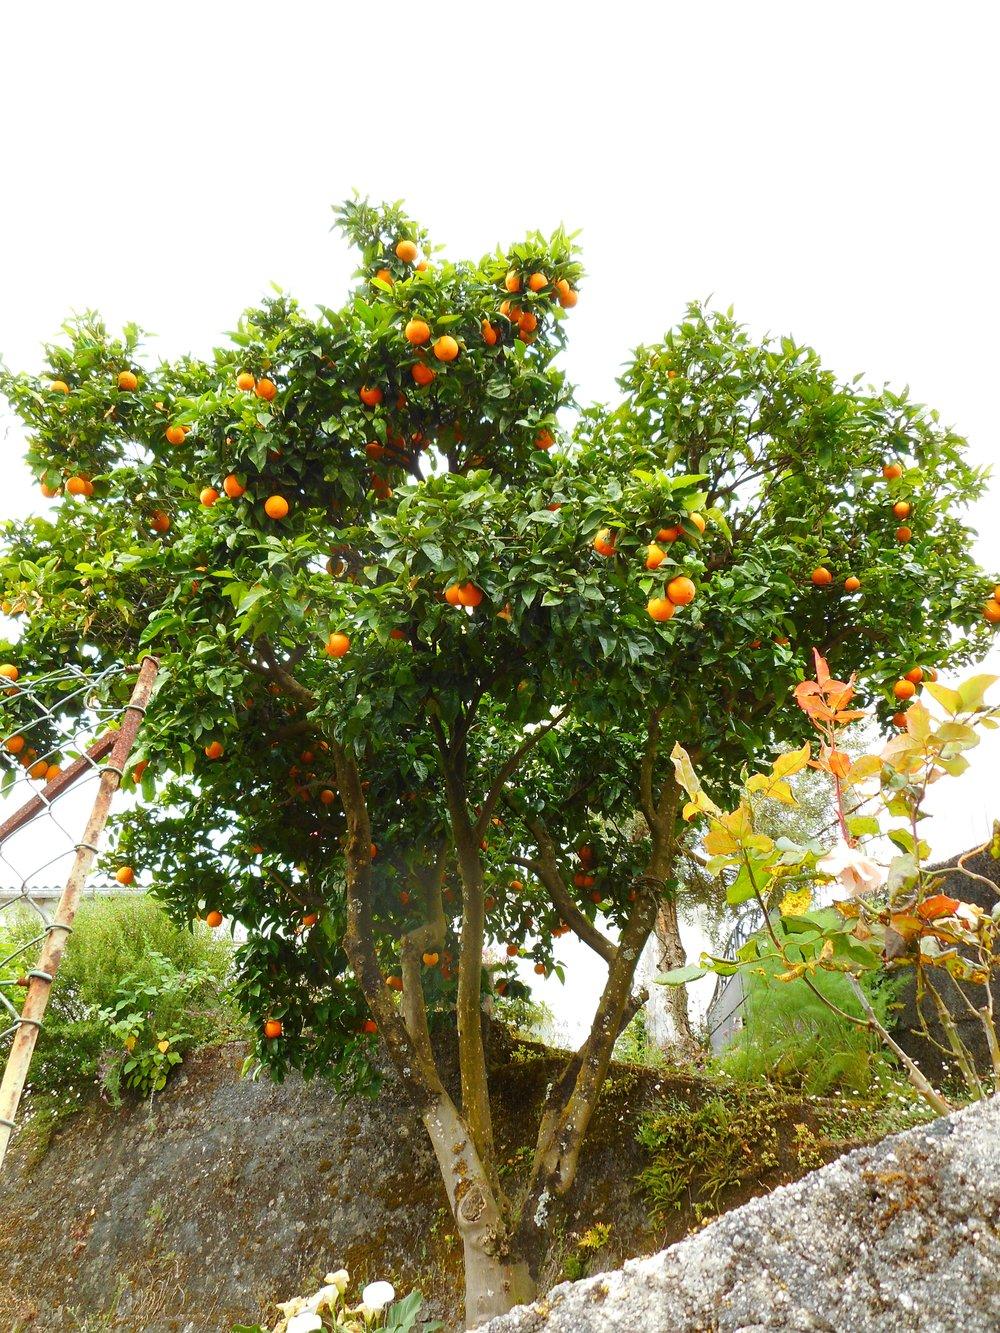 Citrus trees were everywhere